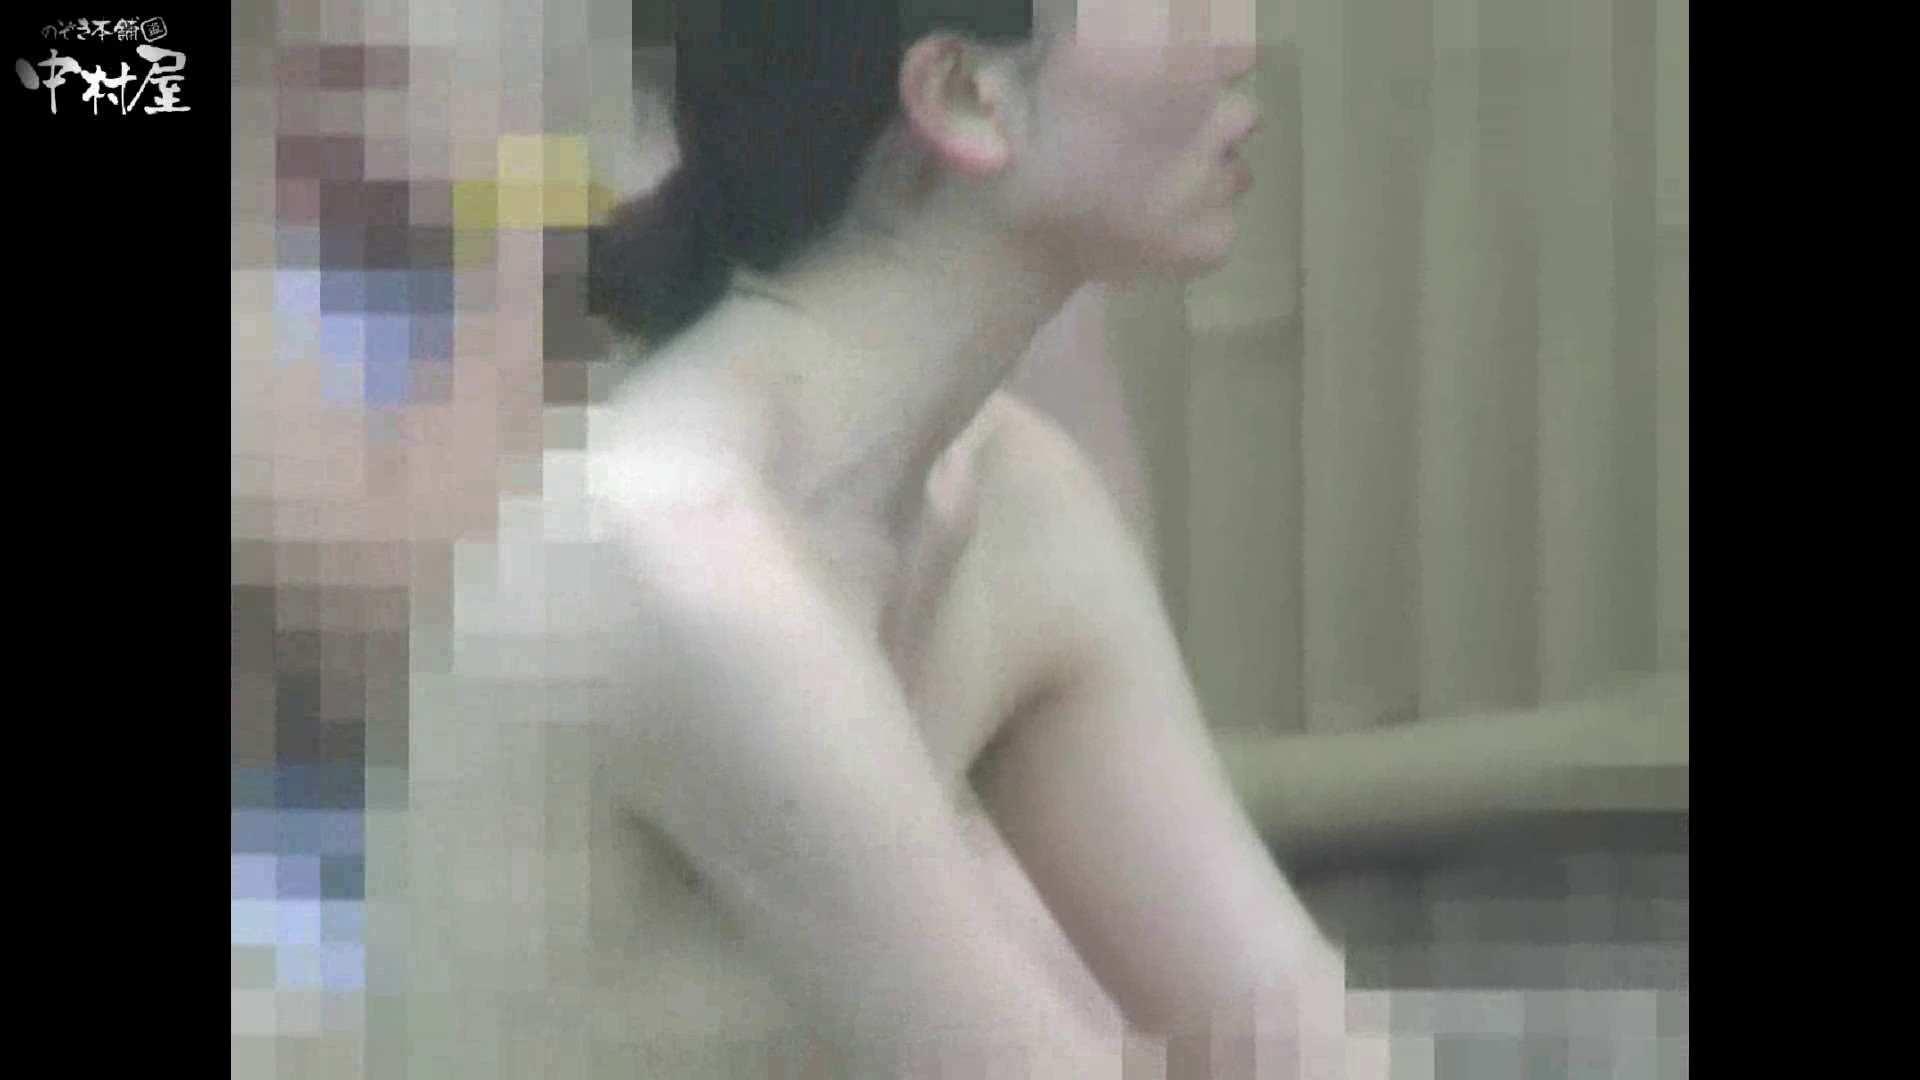 Aquaな露天風呂Vol.878潜入盗撮露天風呂十五判湯 其の五 盗撮シリーズ 盗撮動画紹介 112PIX 80